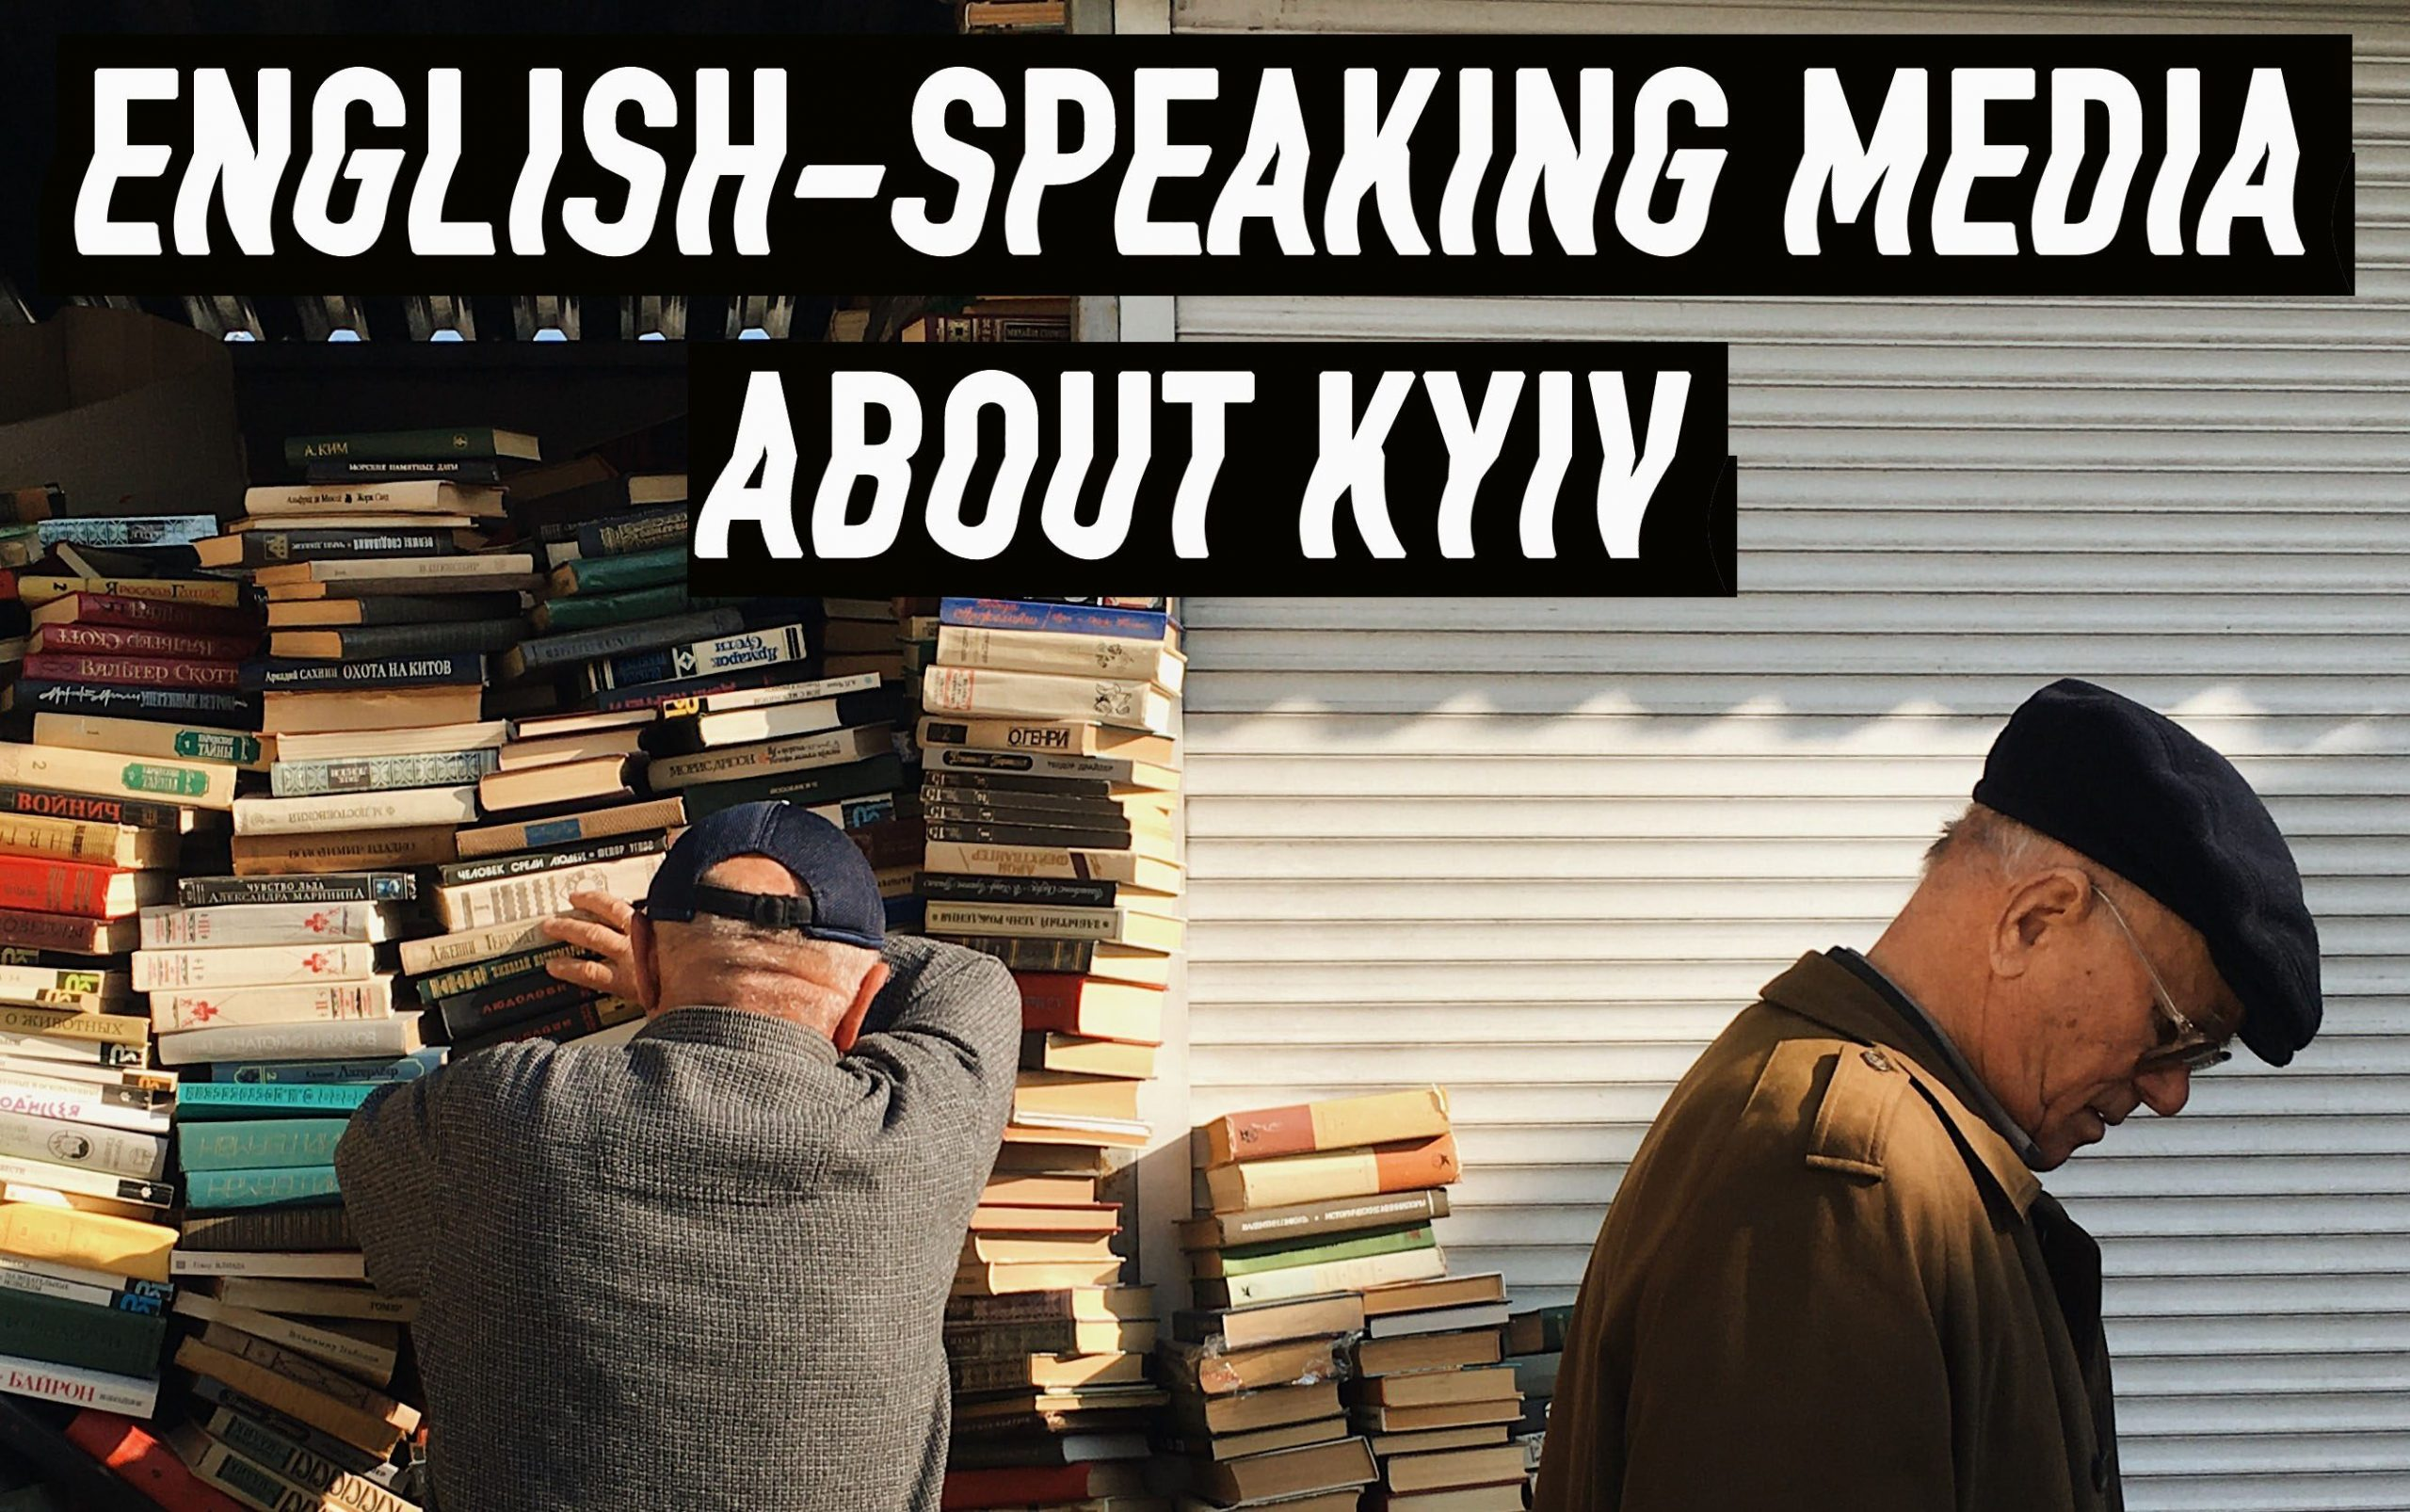 English-speaking media about Kyiv and Ukraine